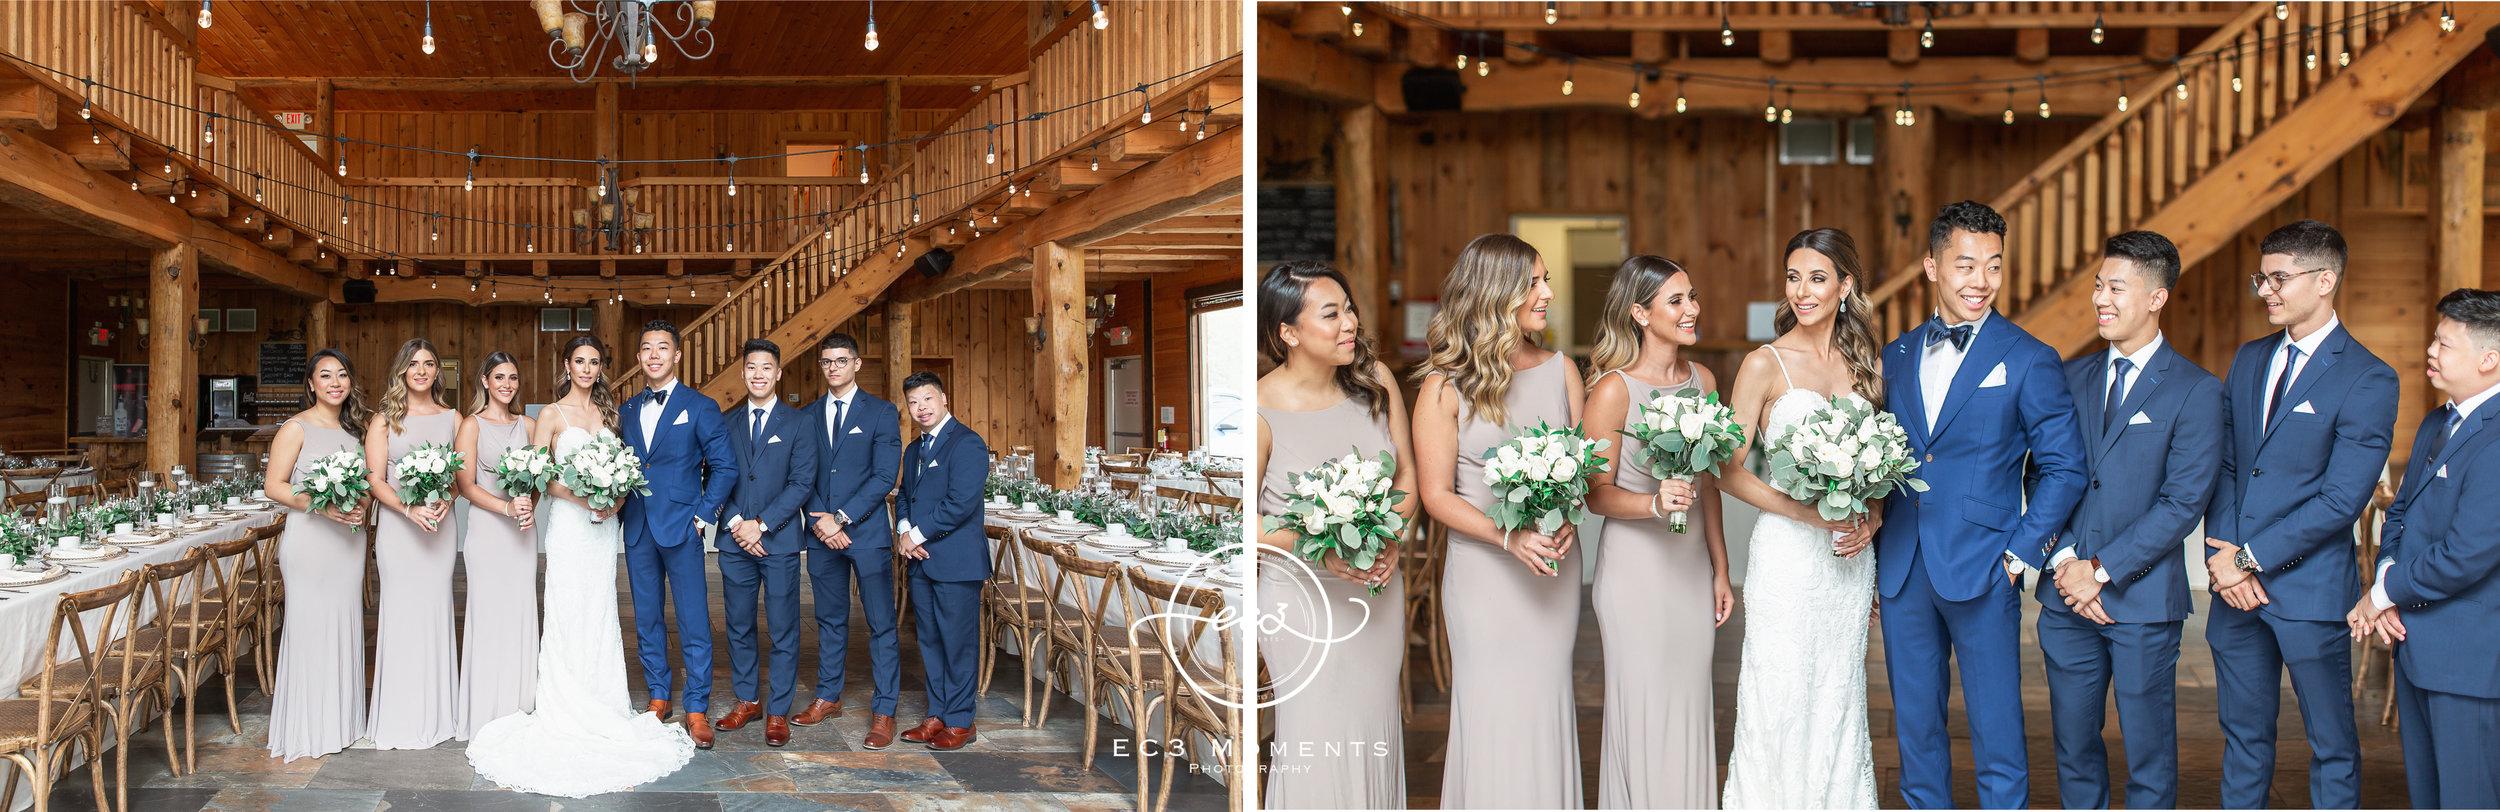 Laura & Ryan Holland Marsh Wineries Wedding 34.jpg